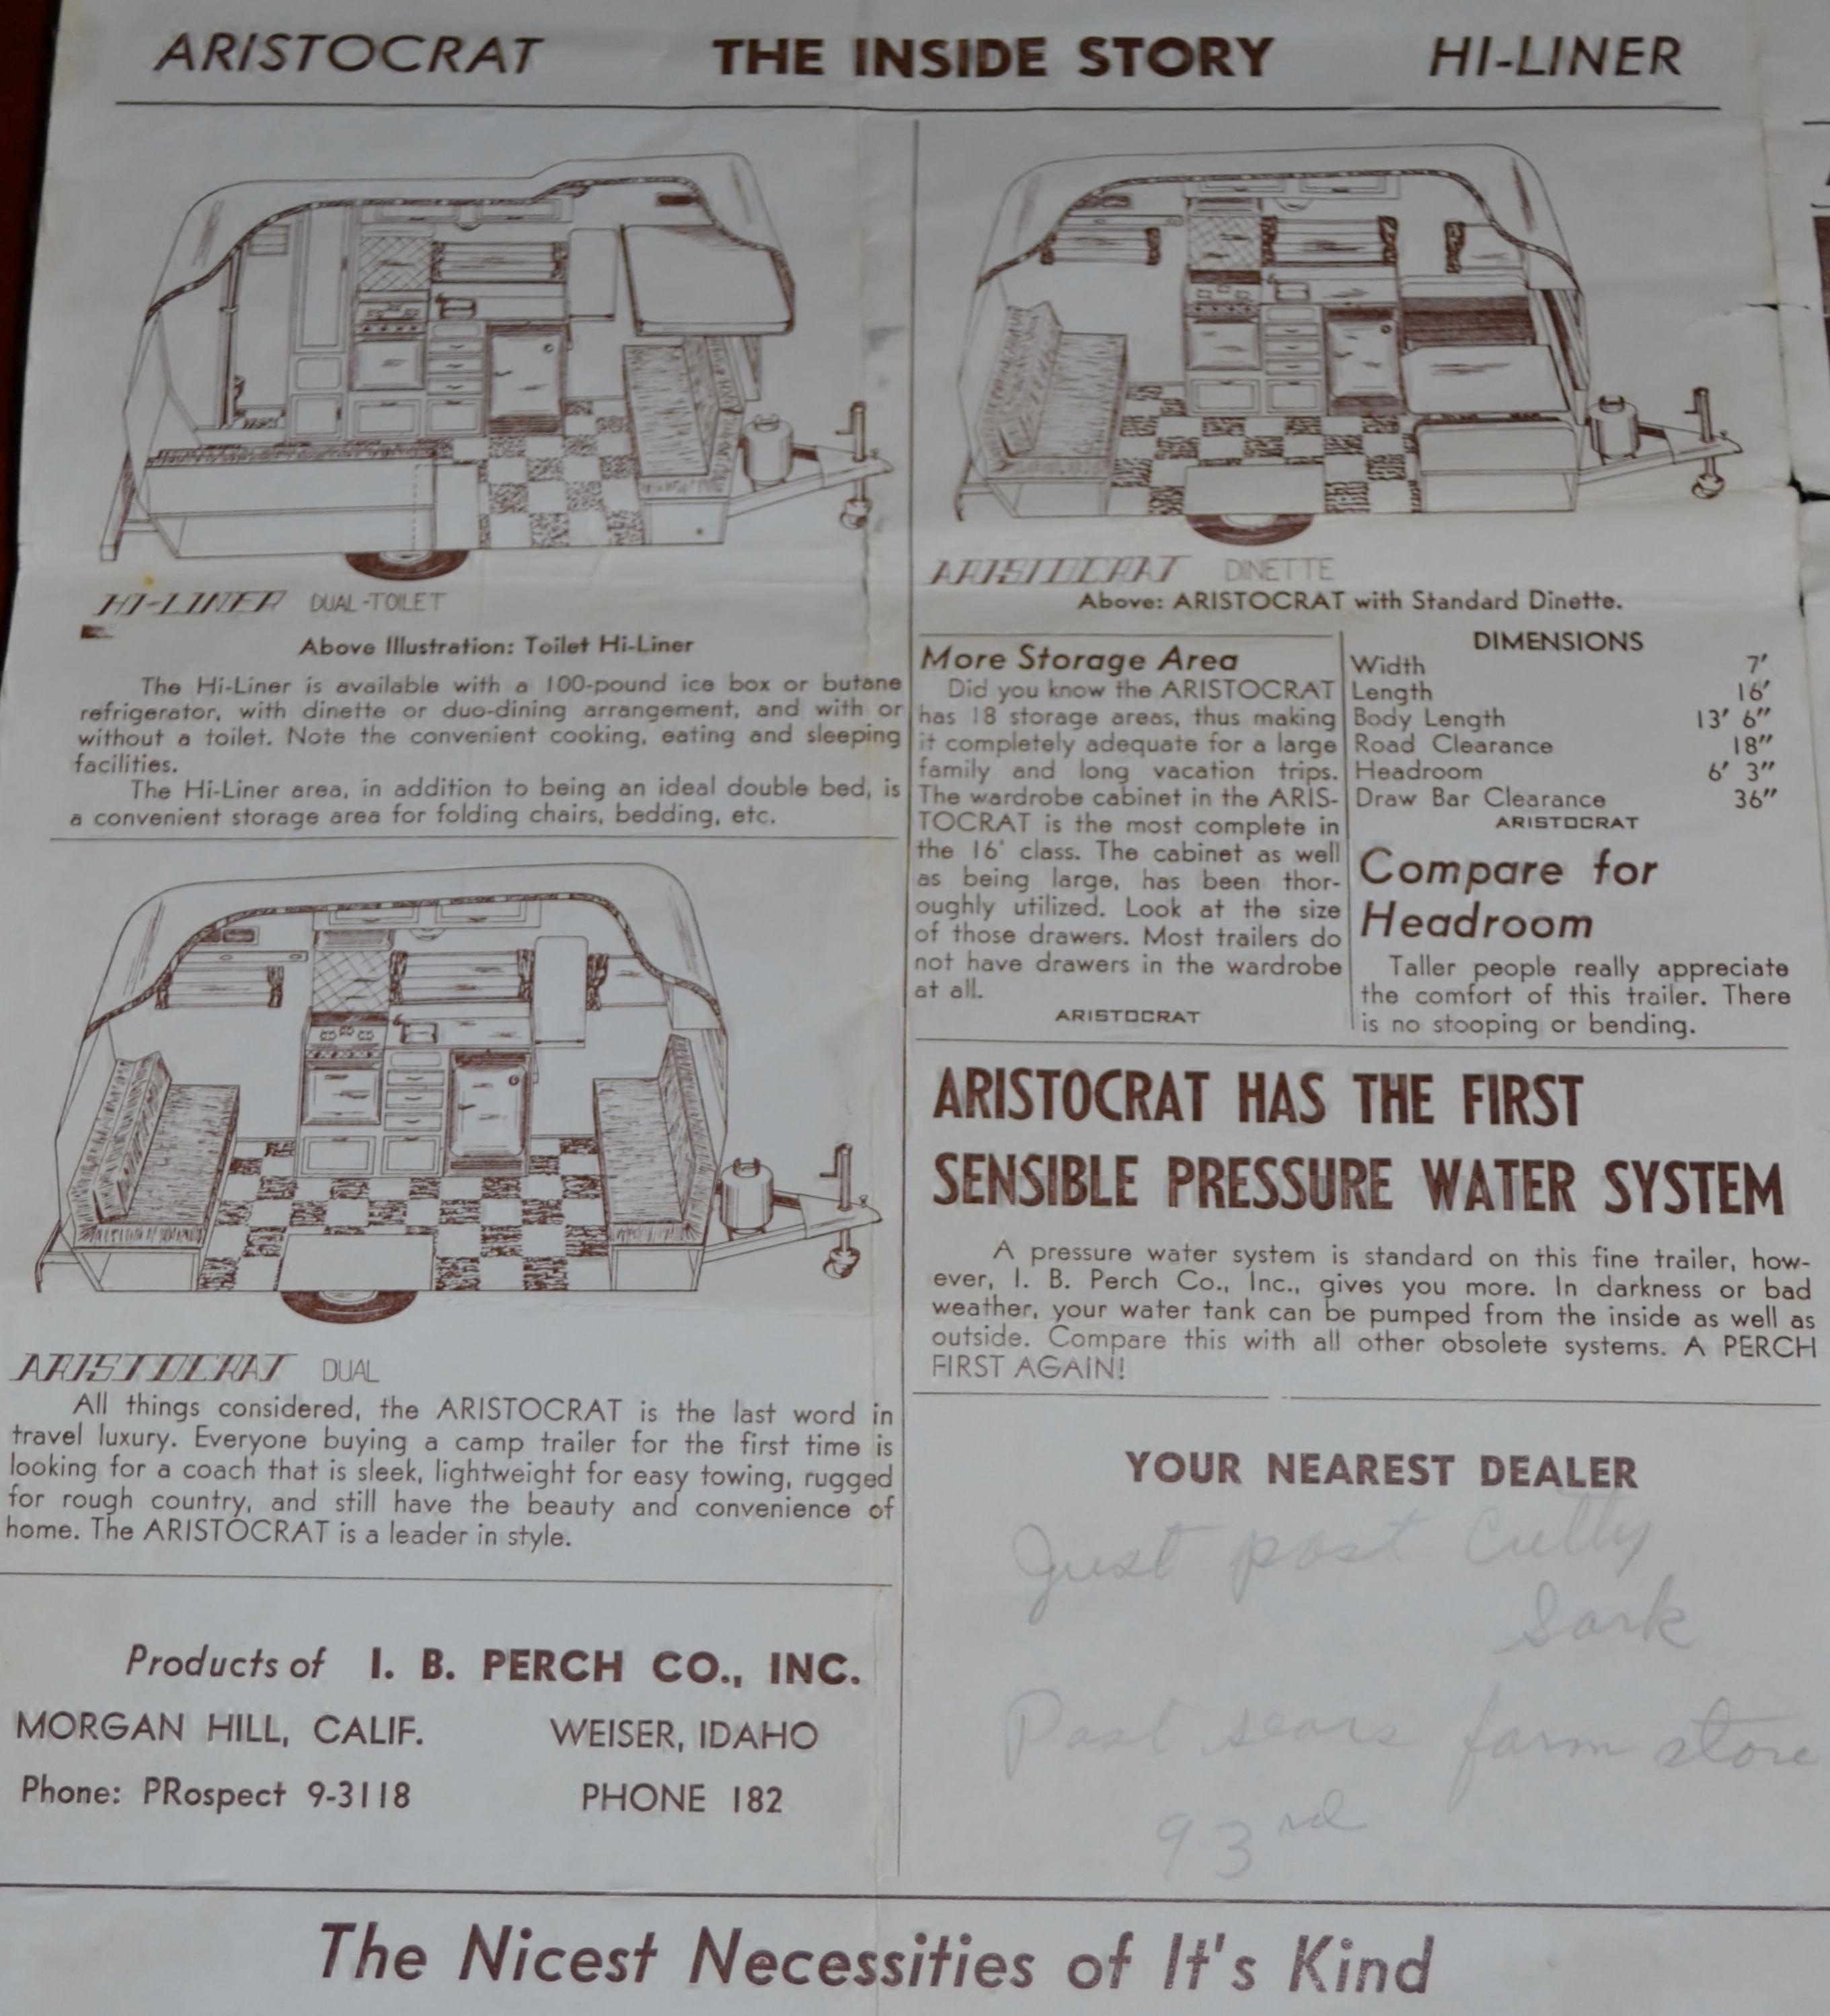 1961 Aristocrat brochure page 2of4 | Hi-Liner | Vintage rv, Vintage on